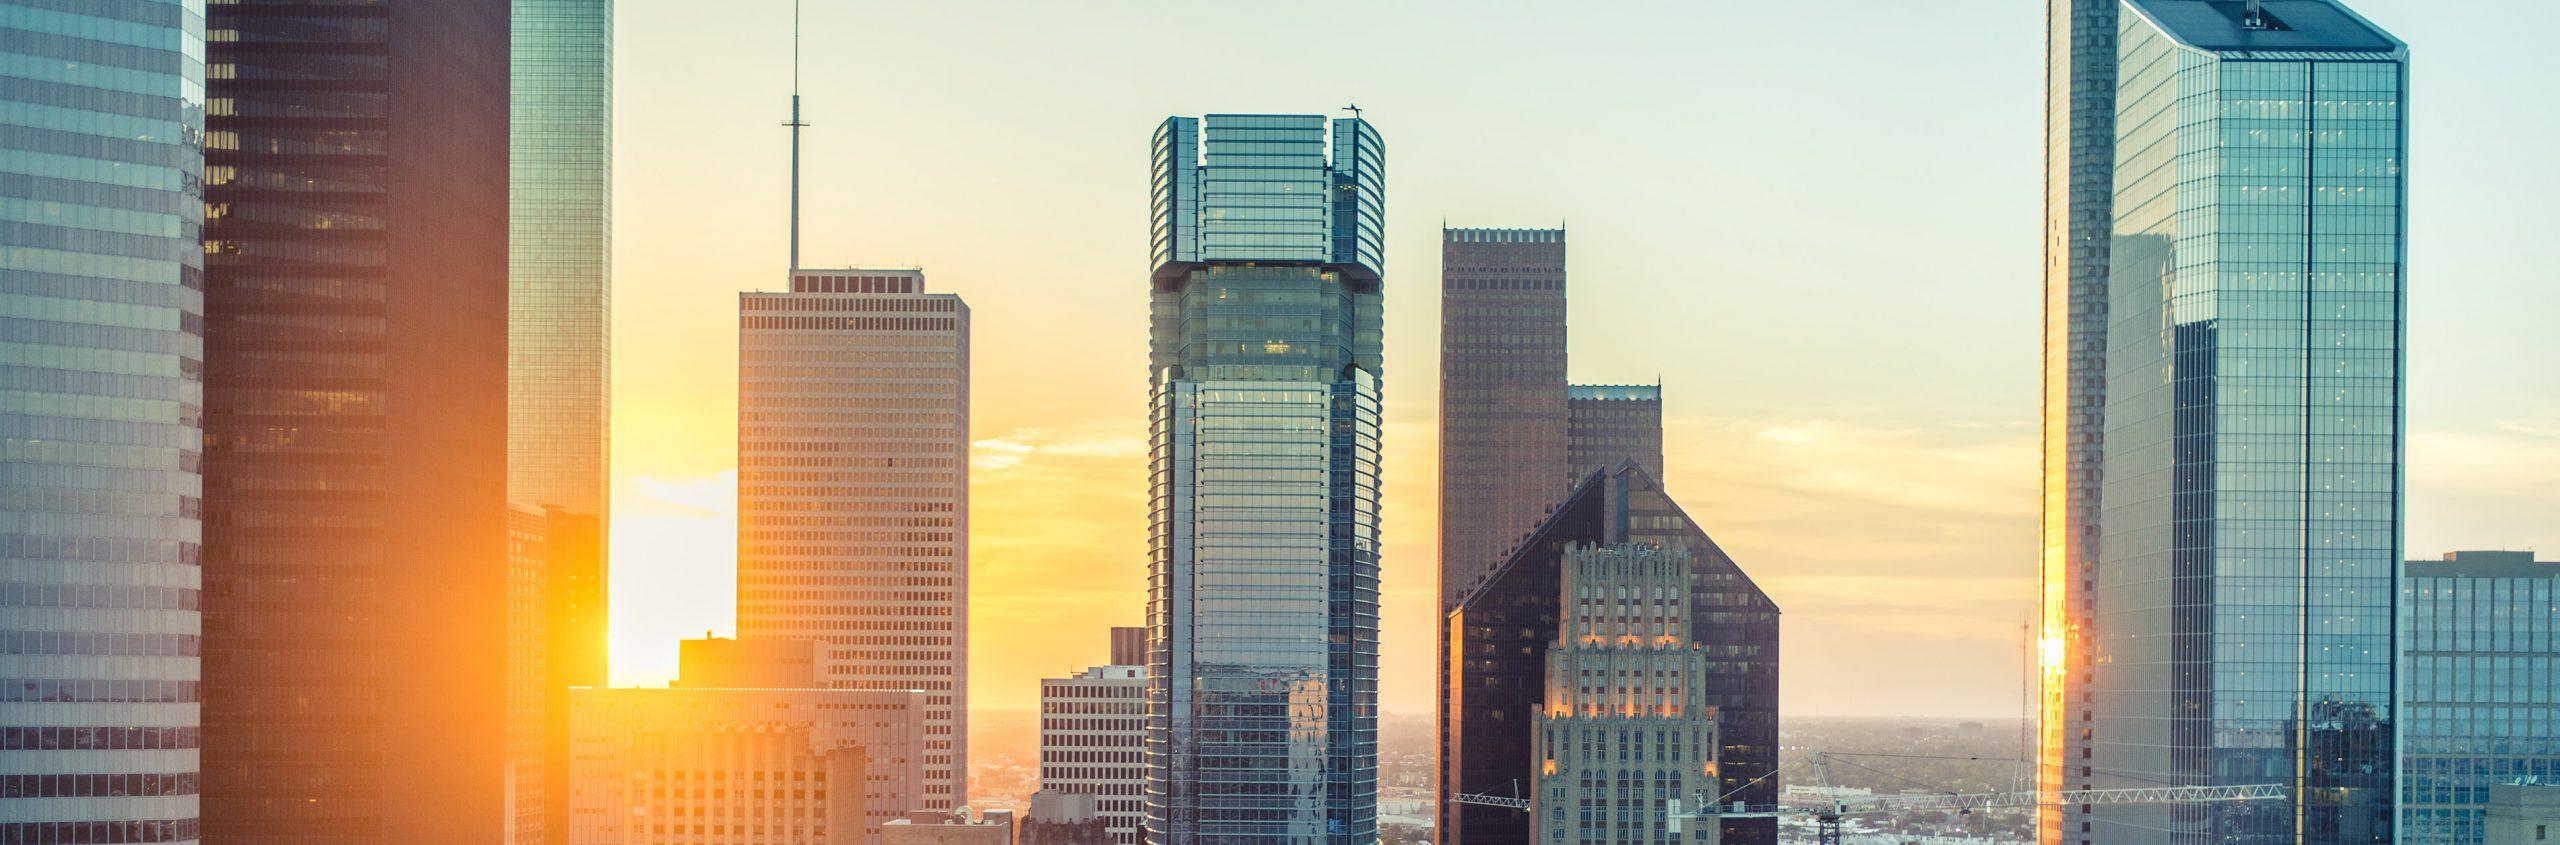 Rycore Capital Asset Management